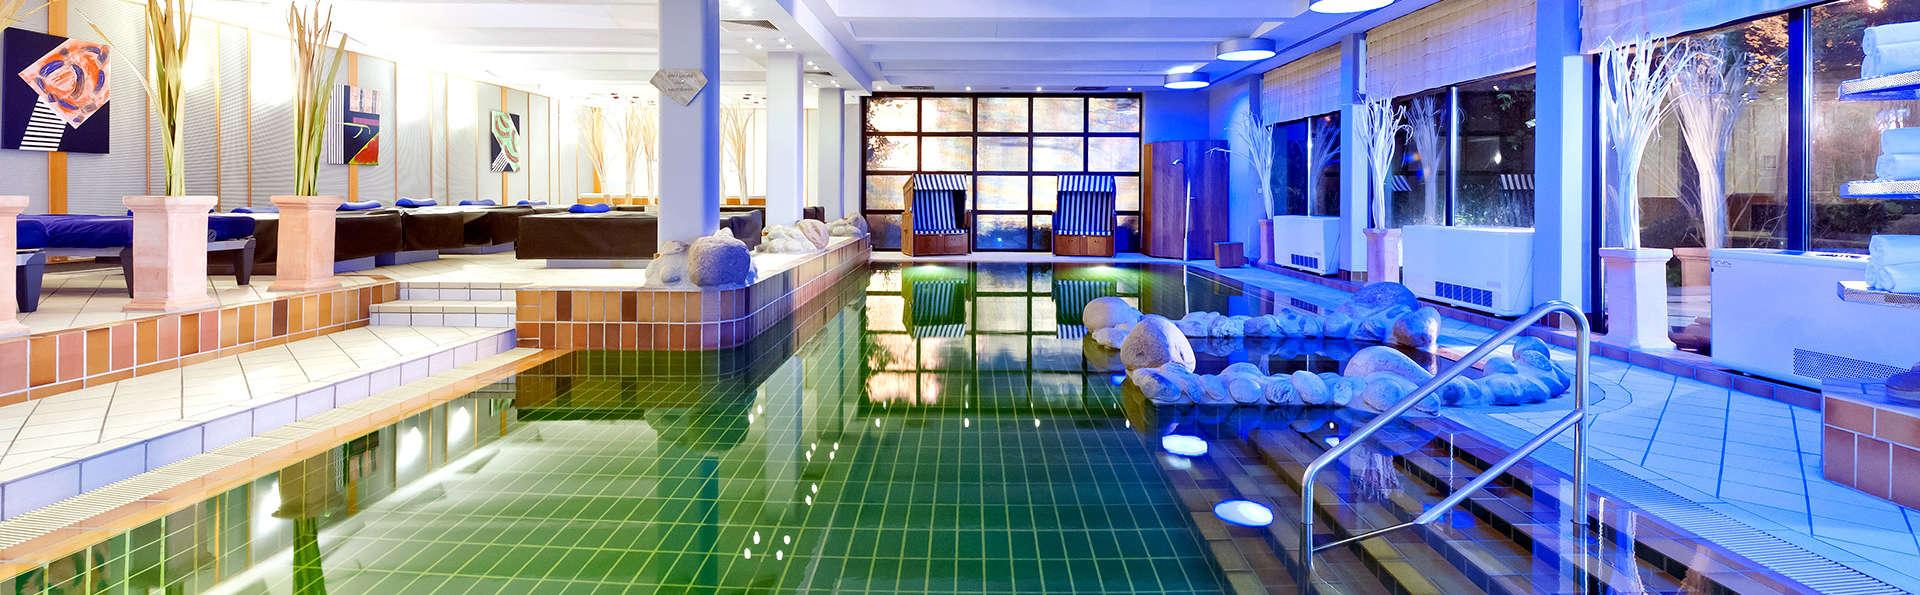 Dorint Parkhotel Mönchengladbach - Edit_Spa.jpg